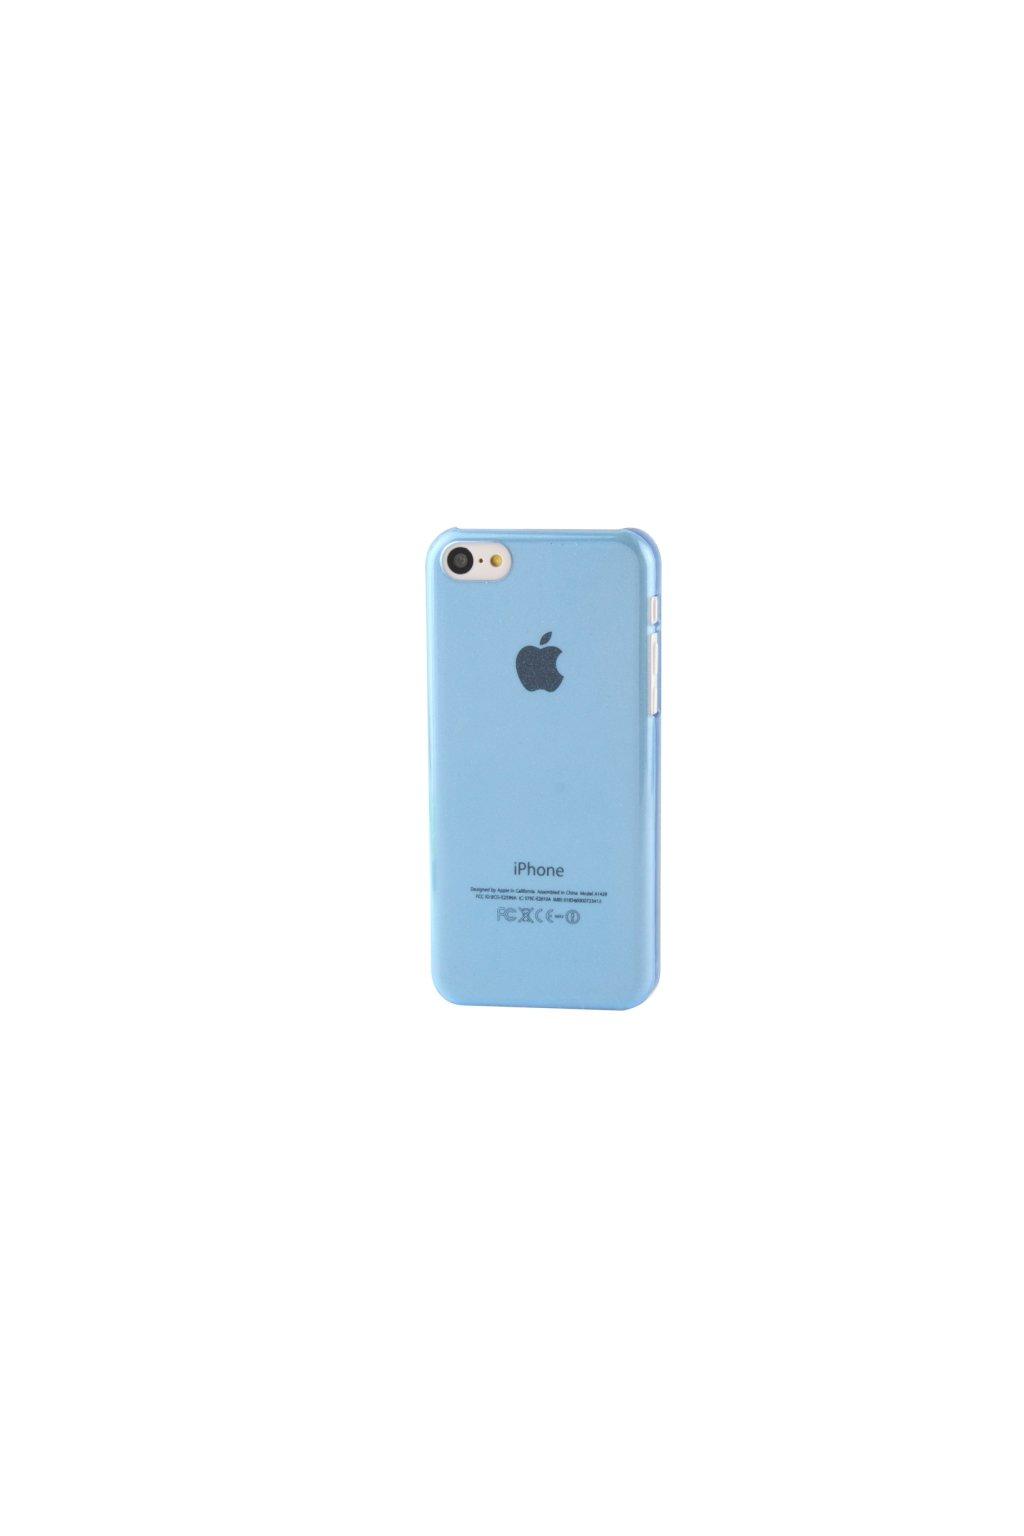 Pouzdro Powder plastové iPhone 5C, blue/modrá